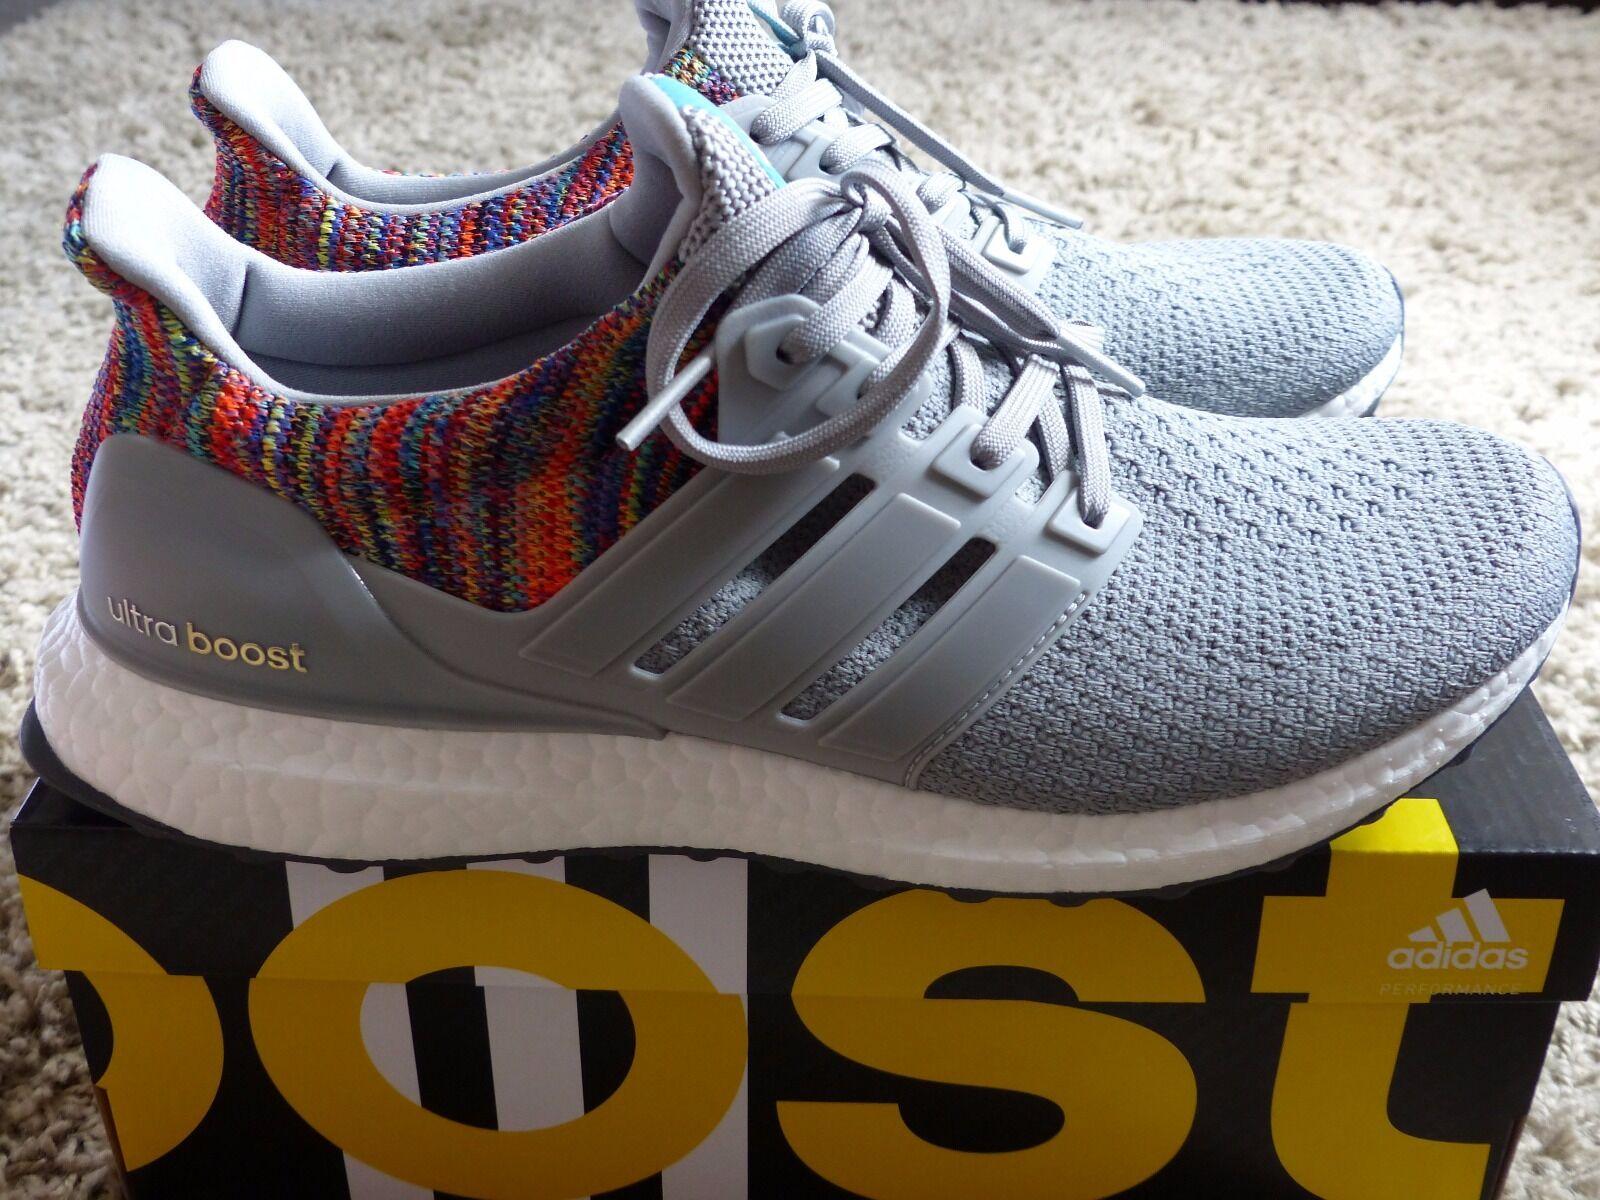 Adidas Ultra Bottes 2.0 Gris Multicolour UK9 US9.5 miAdidas ltd to 7000 pairs sns